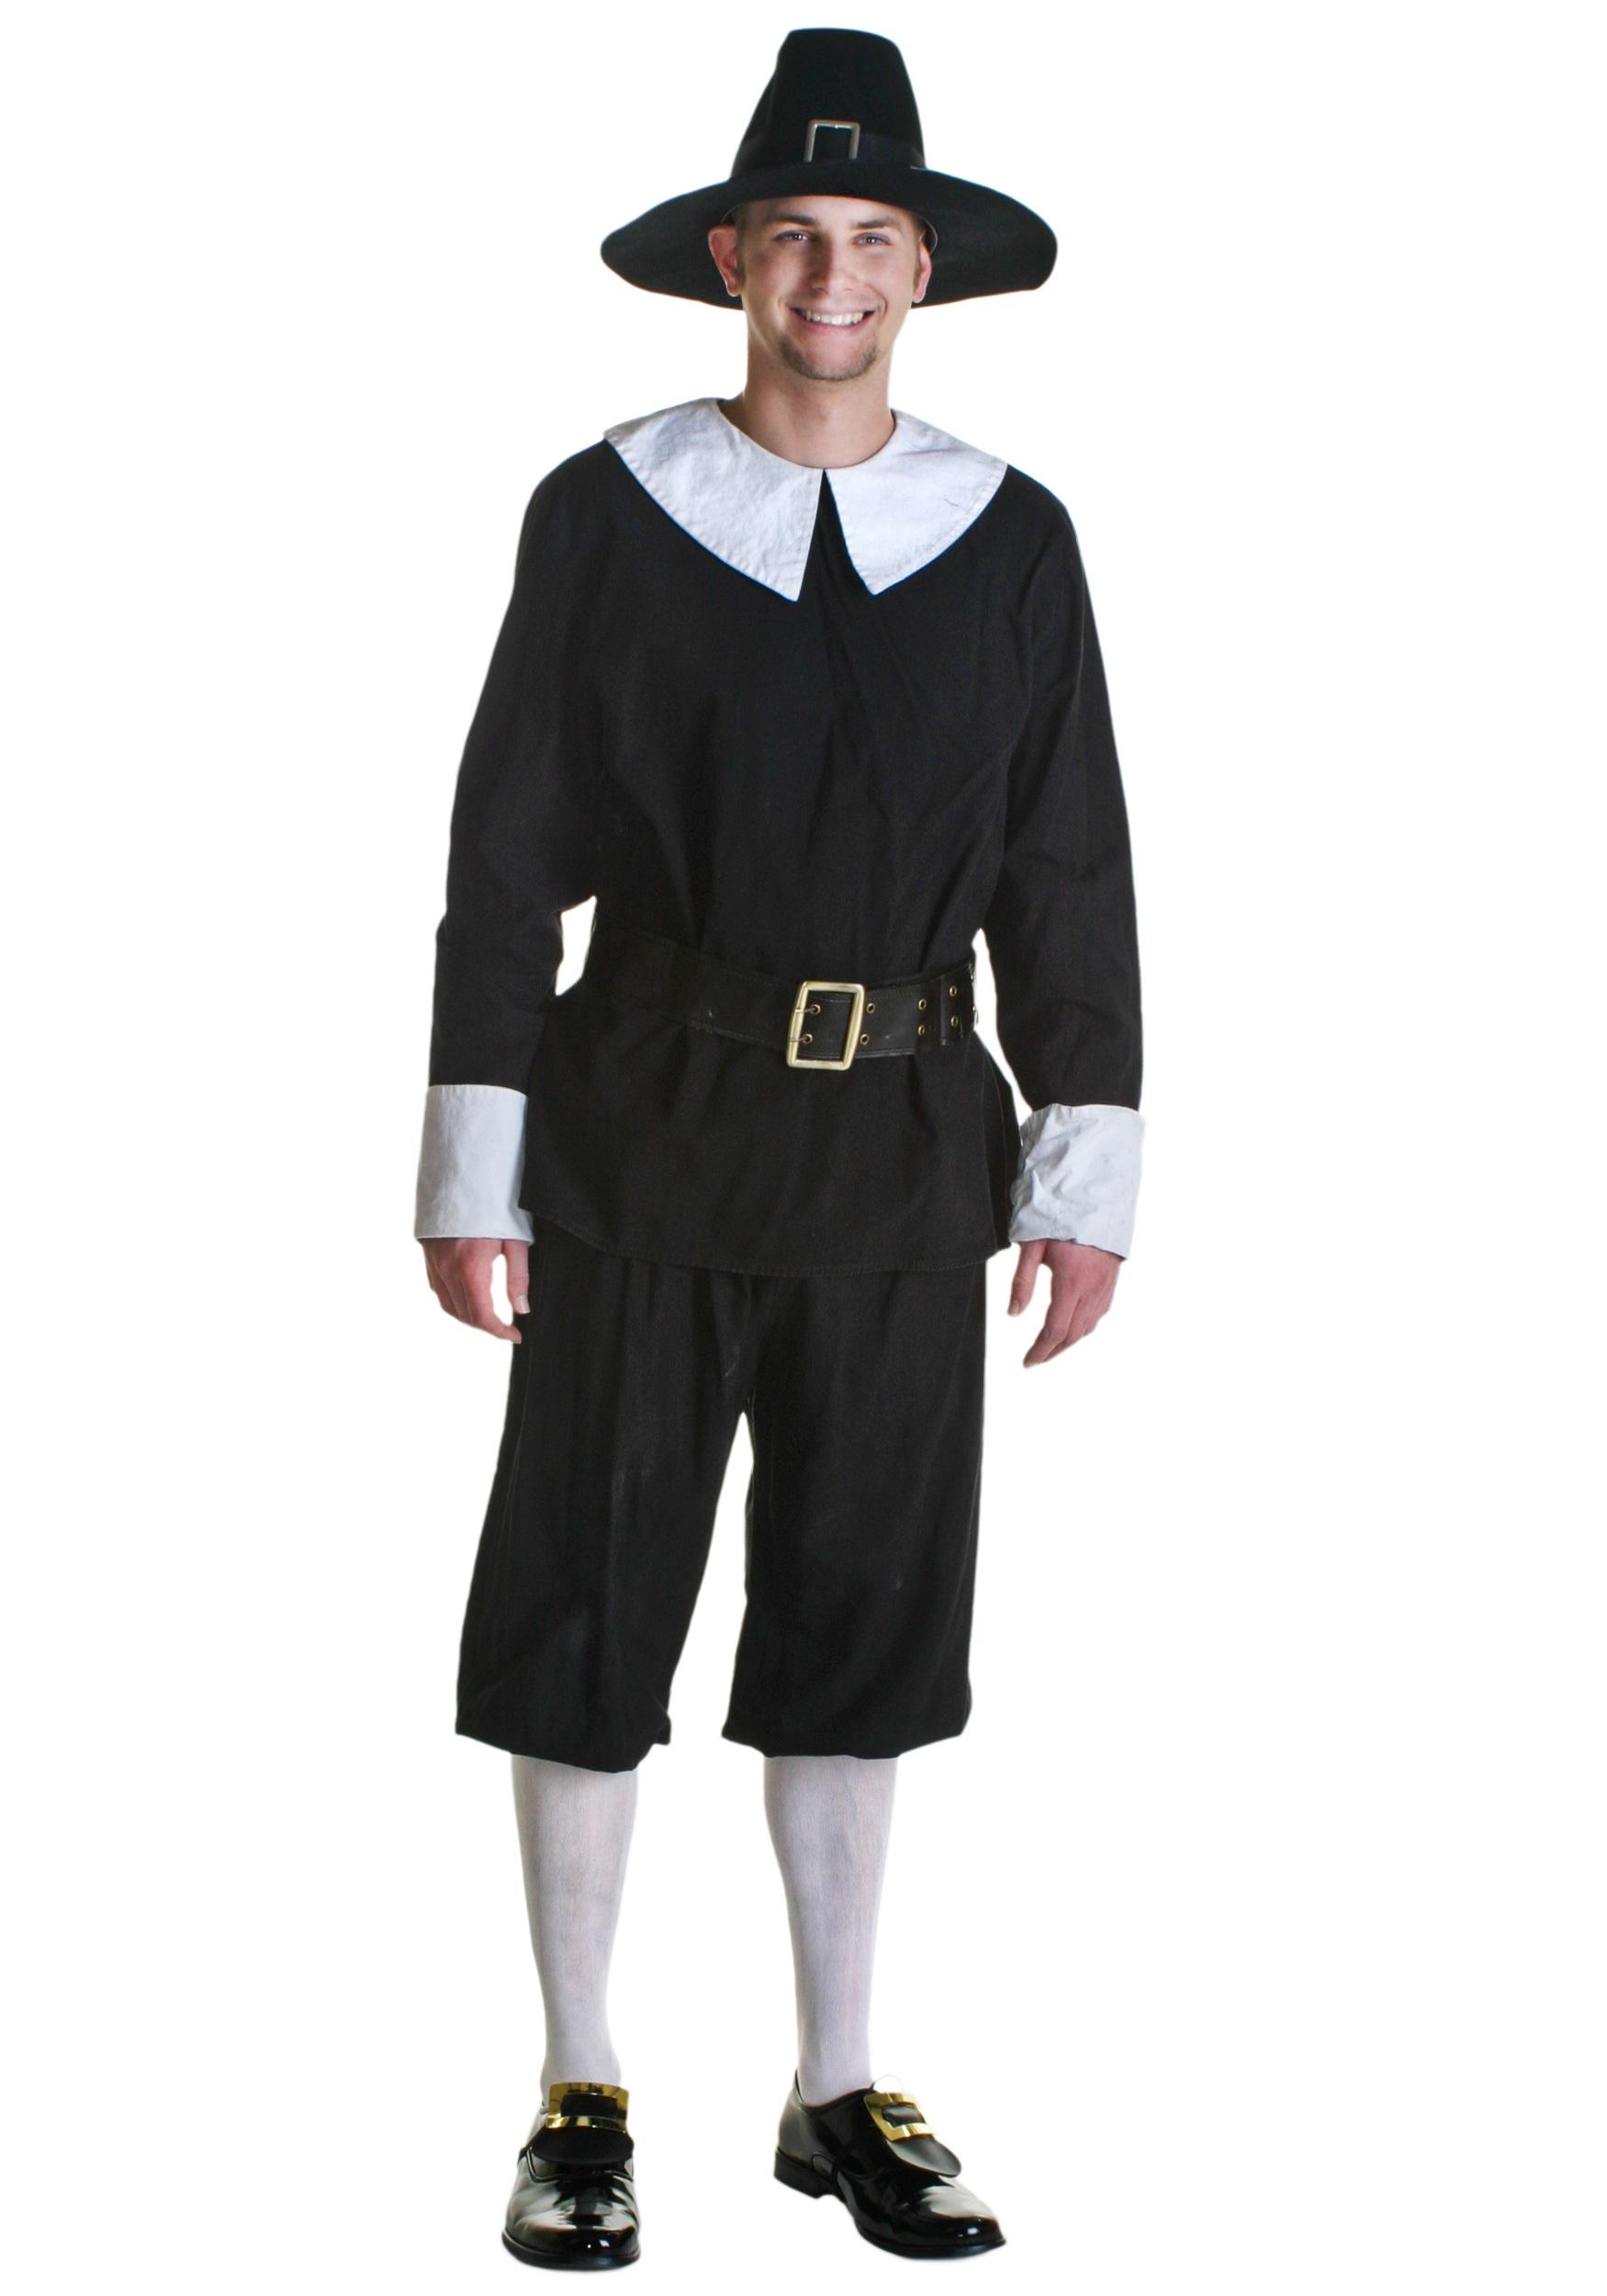 attire for thanksgiving dinner